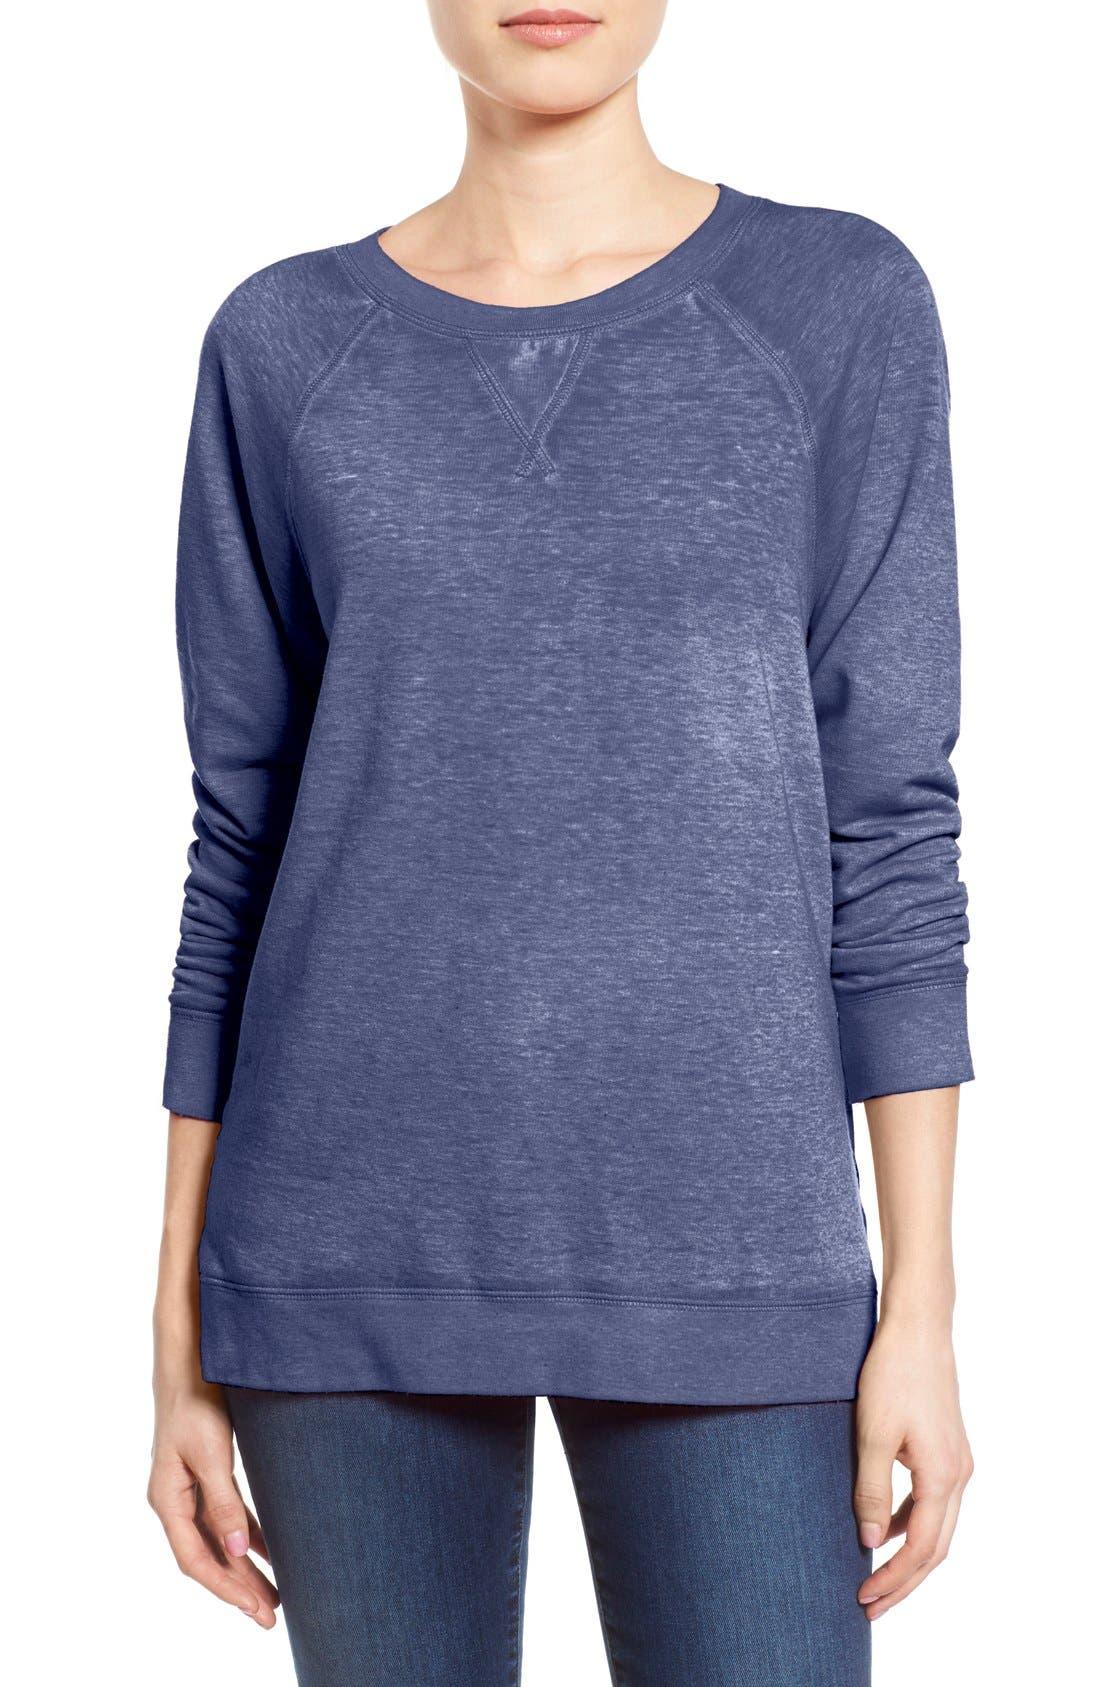 Alternate Image 1 Selected - Caslon® Burnout Sweatshirt